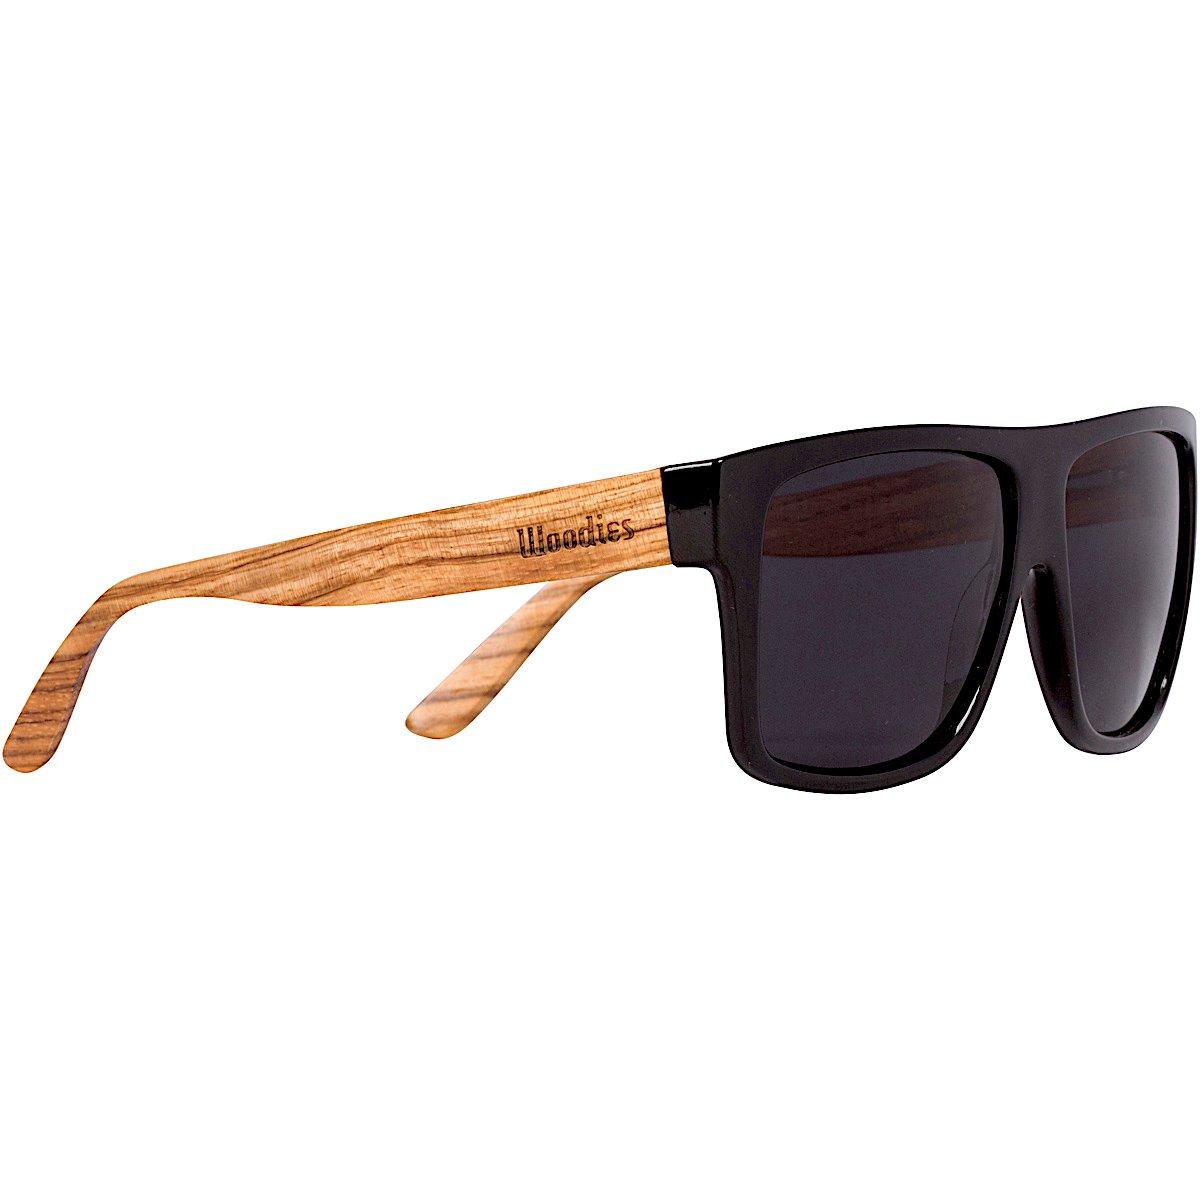 WOODIES Zebra Wood Aviator Wrap Sunglasses with Black Polarized Lenses